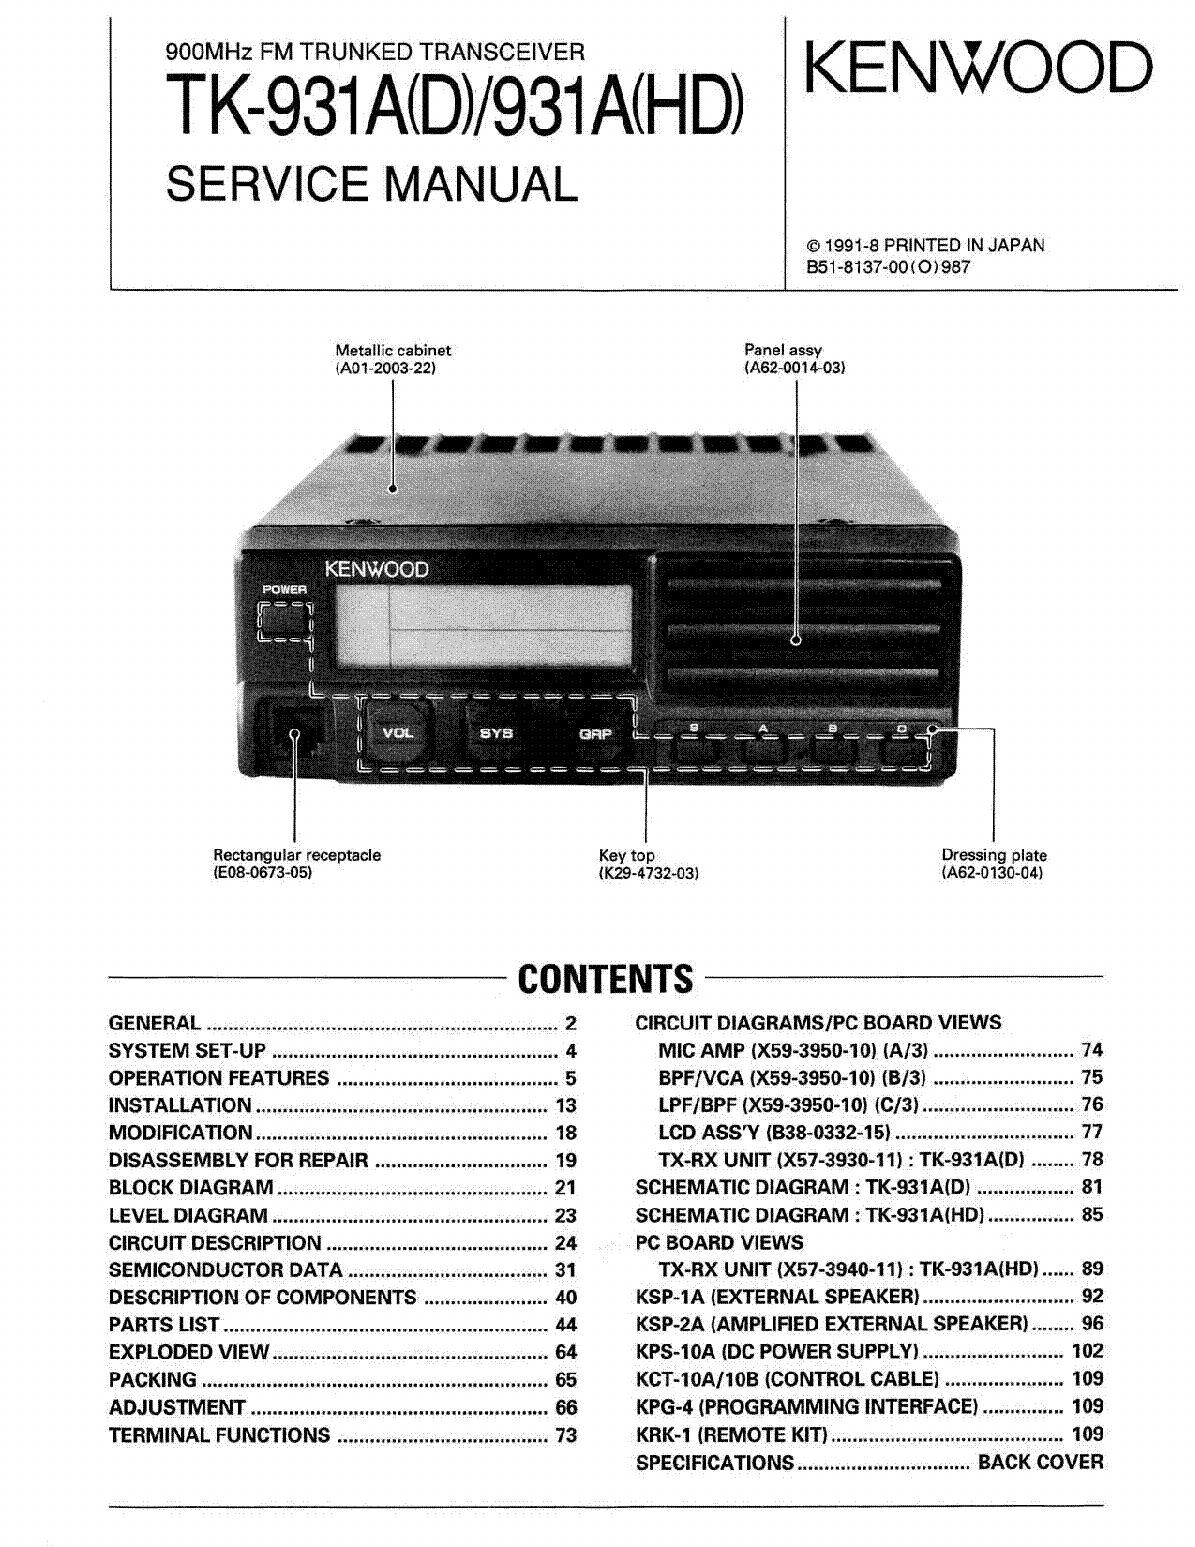 kenwood tk 931a d hd sm service manual download schematics eeprom rh elektrotanya com Kenwood TK-7180 School Radio Kenwood TK-7180 School Radio